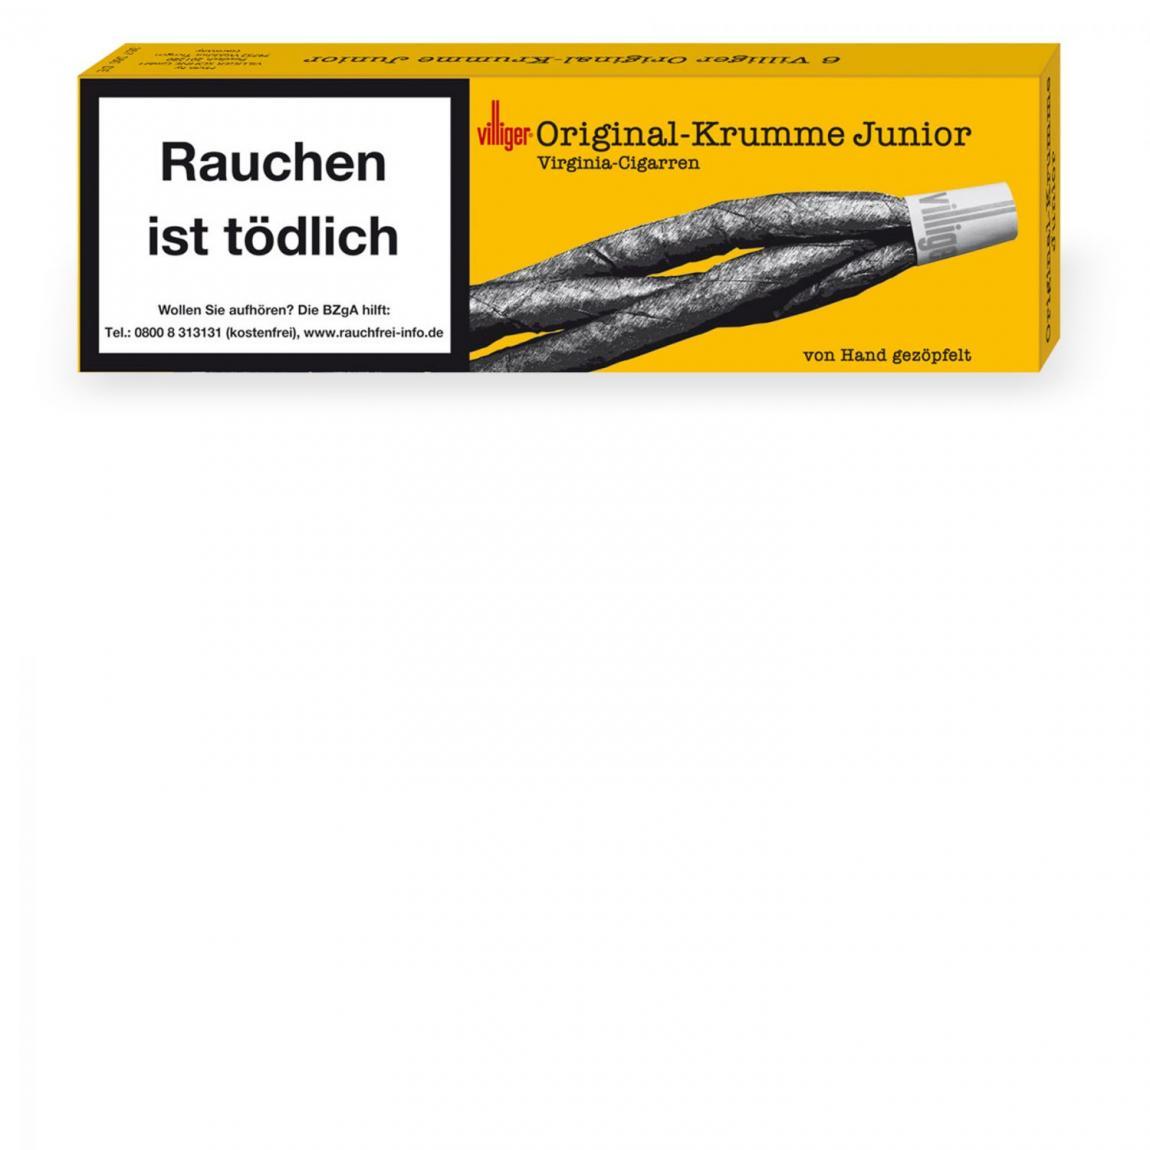 Villiger Original-Krumme Junior 6er Schachtel